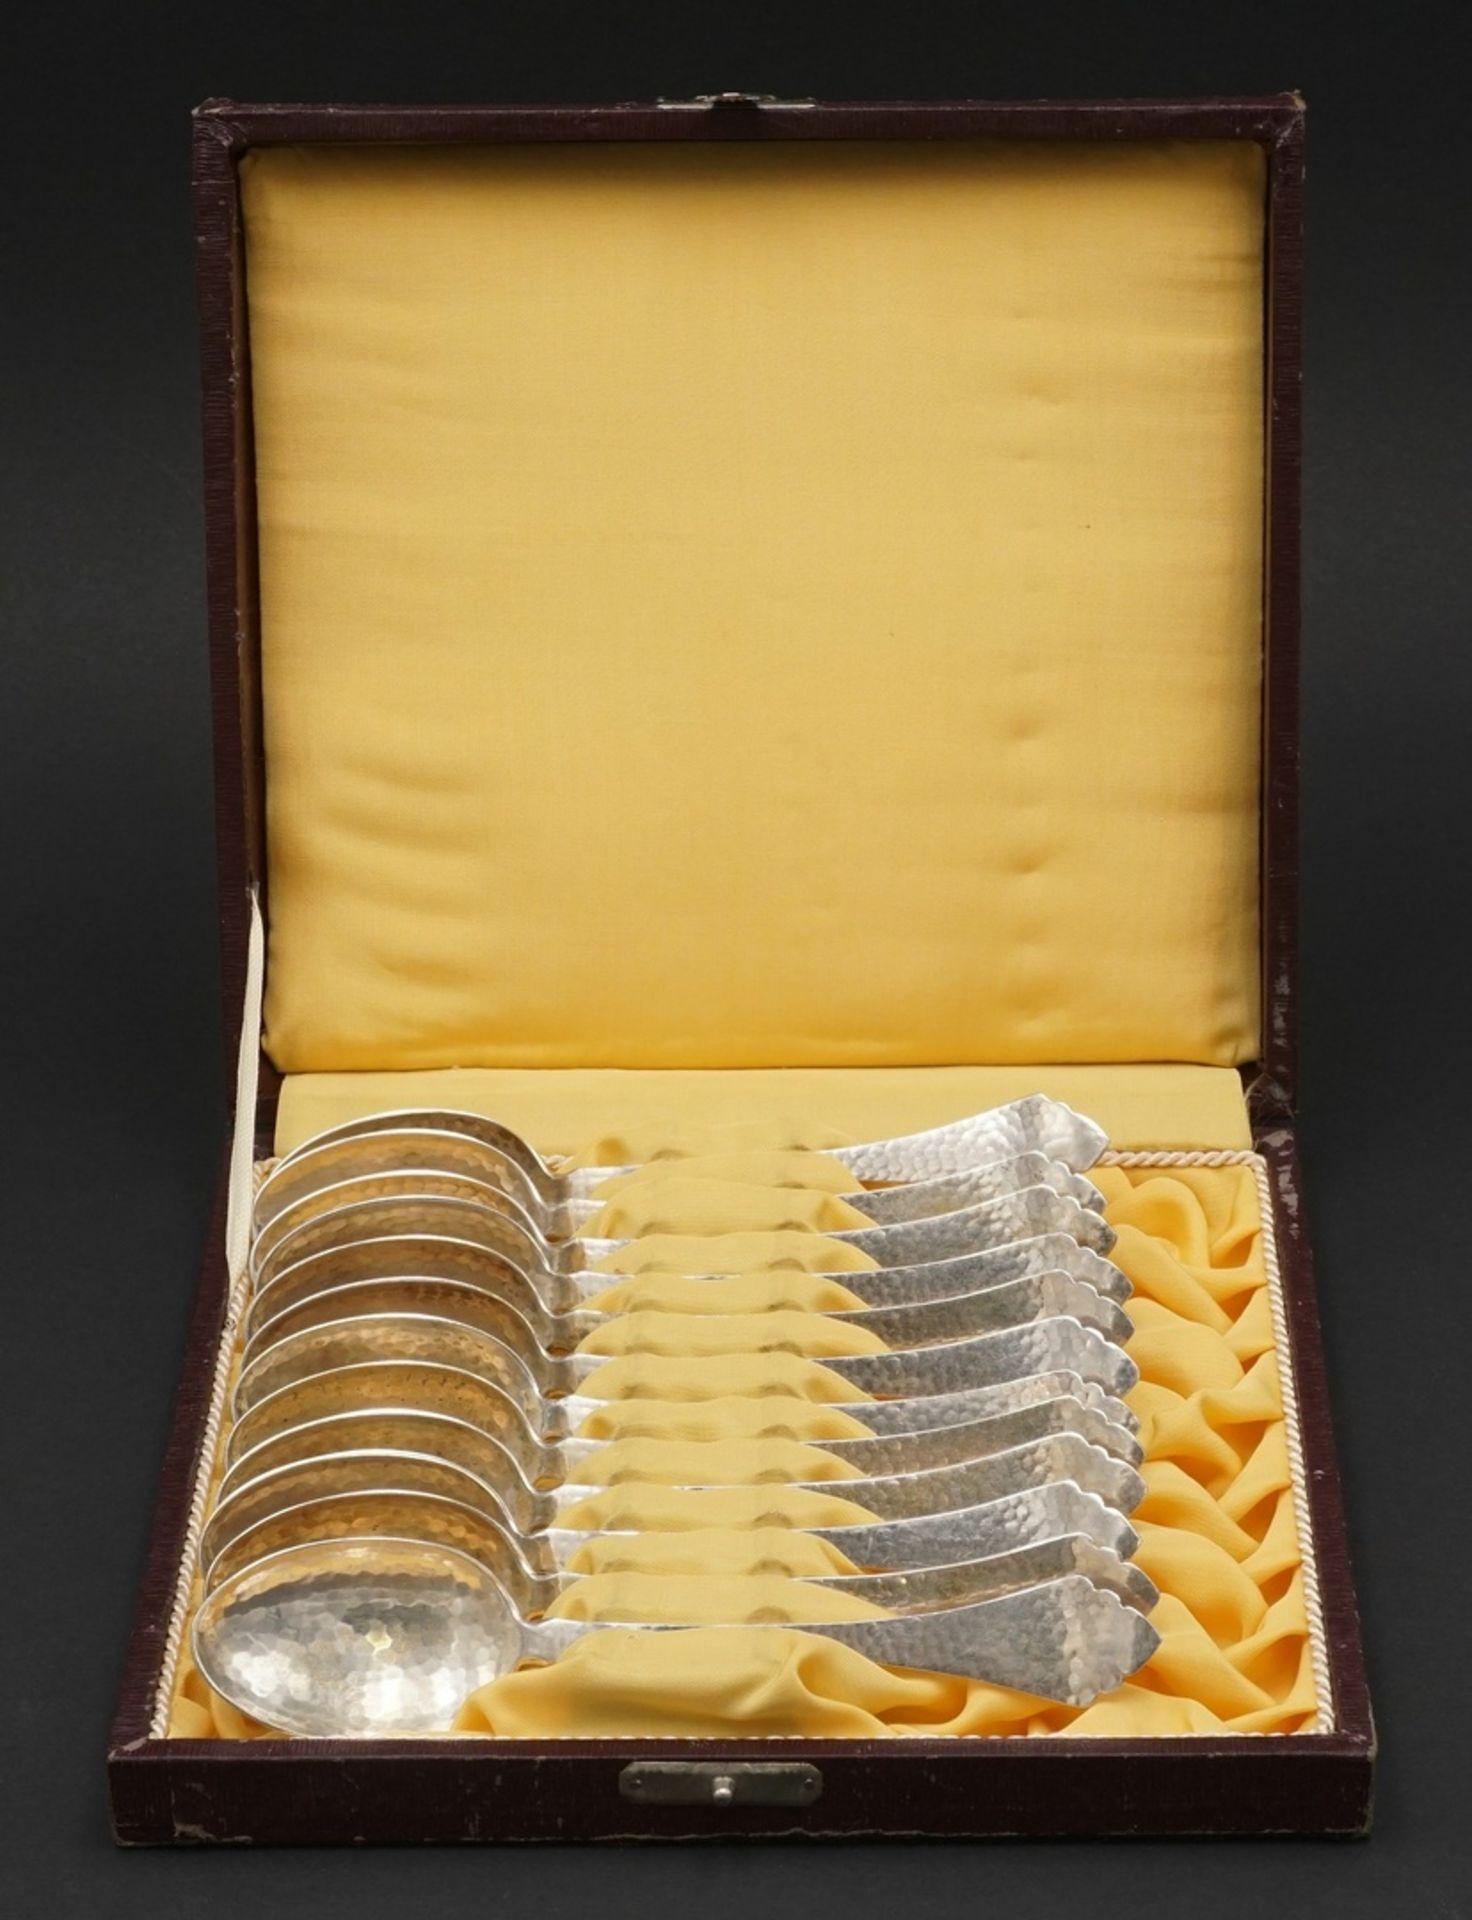 12 Mansfelder Silber Kaffeelöffel, 1917 - 1962 - Bild 2 aus 4